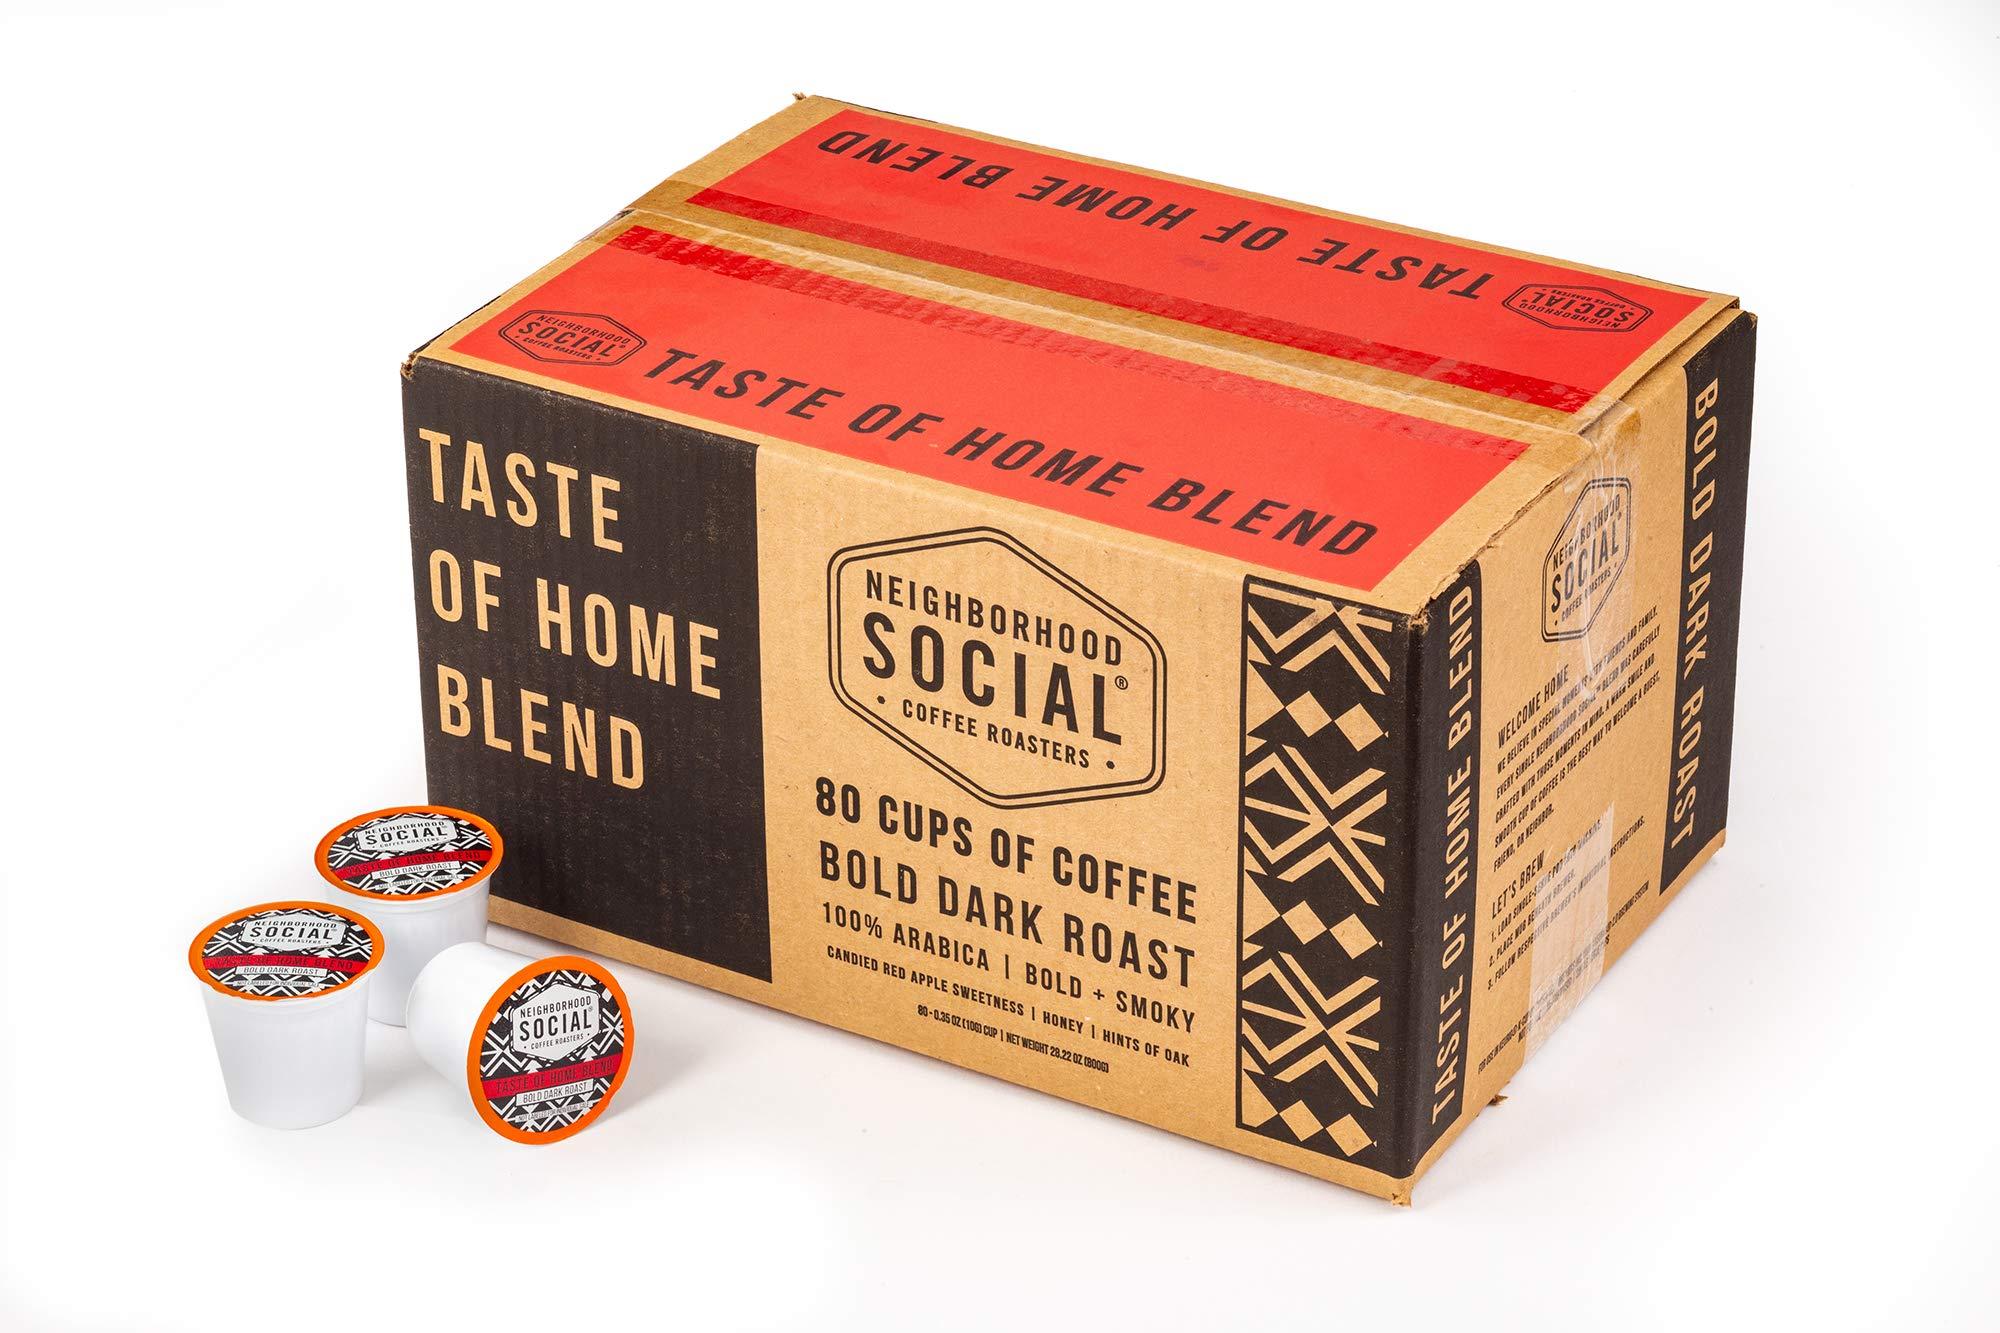 Neighborhood Social, Taste of Home Bold Dark Roast Gourmet Coffee, 80 count Single Serve Cups